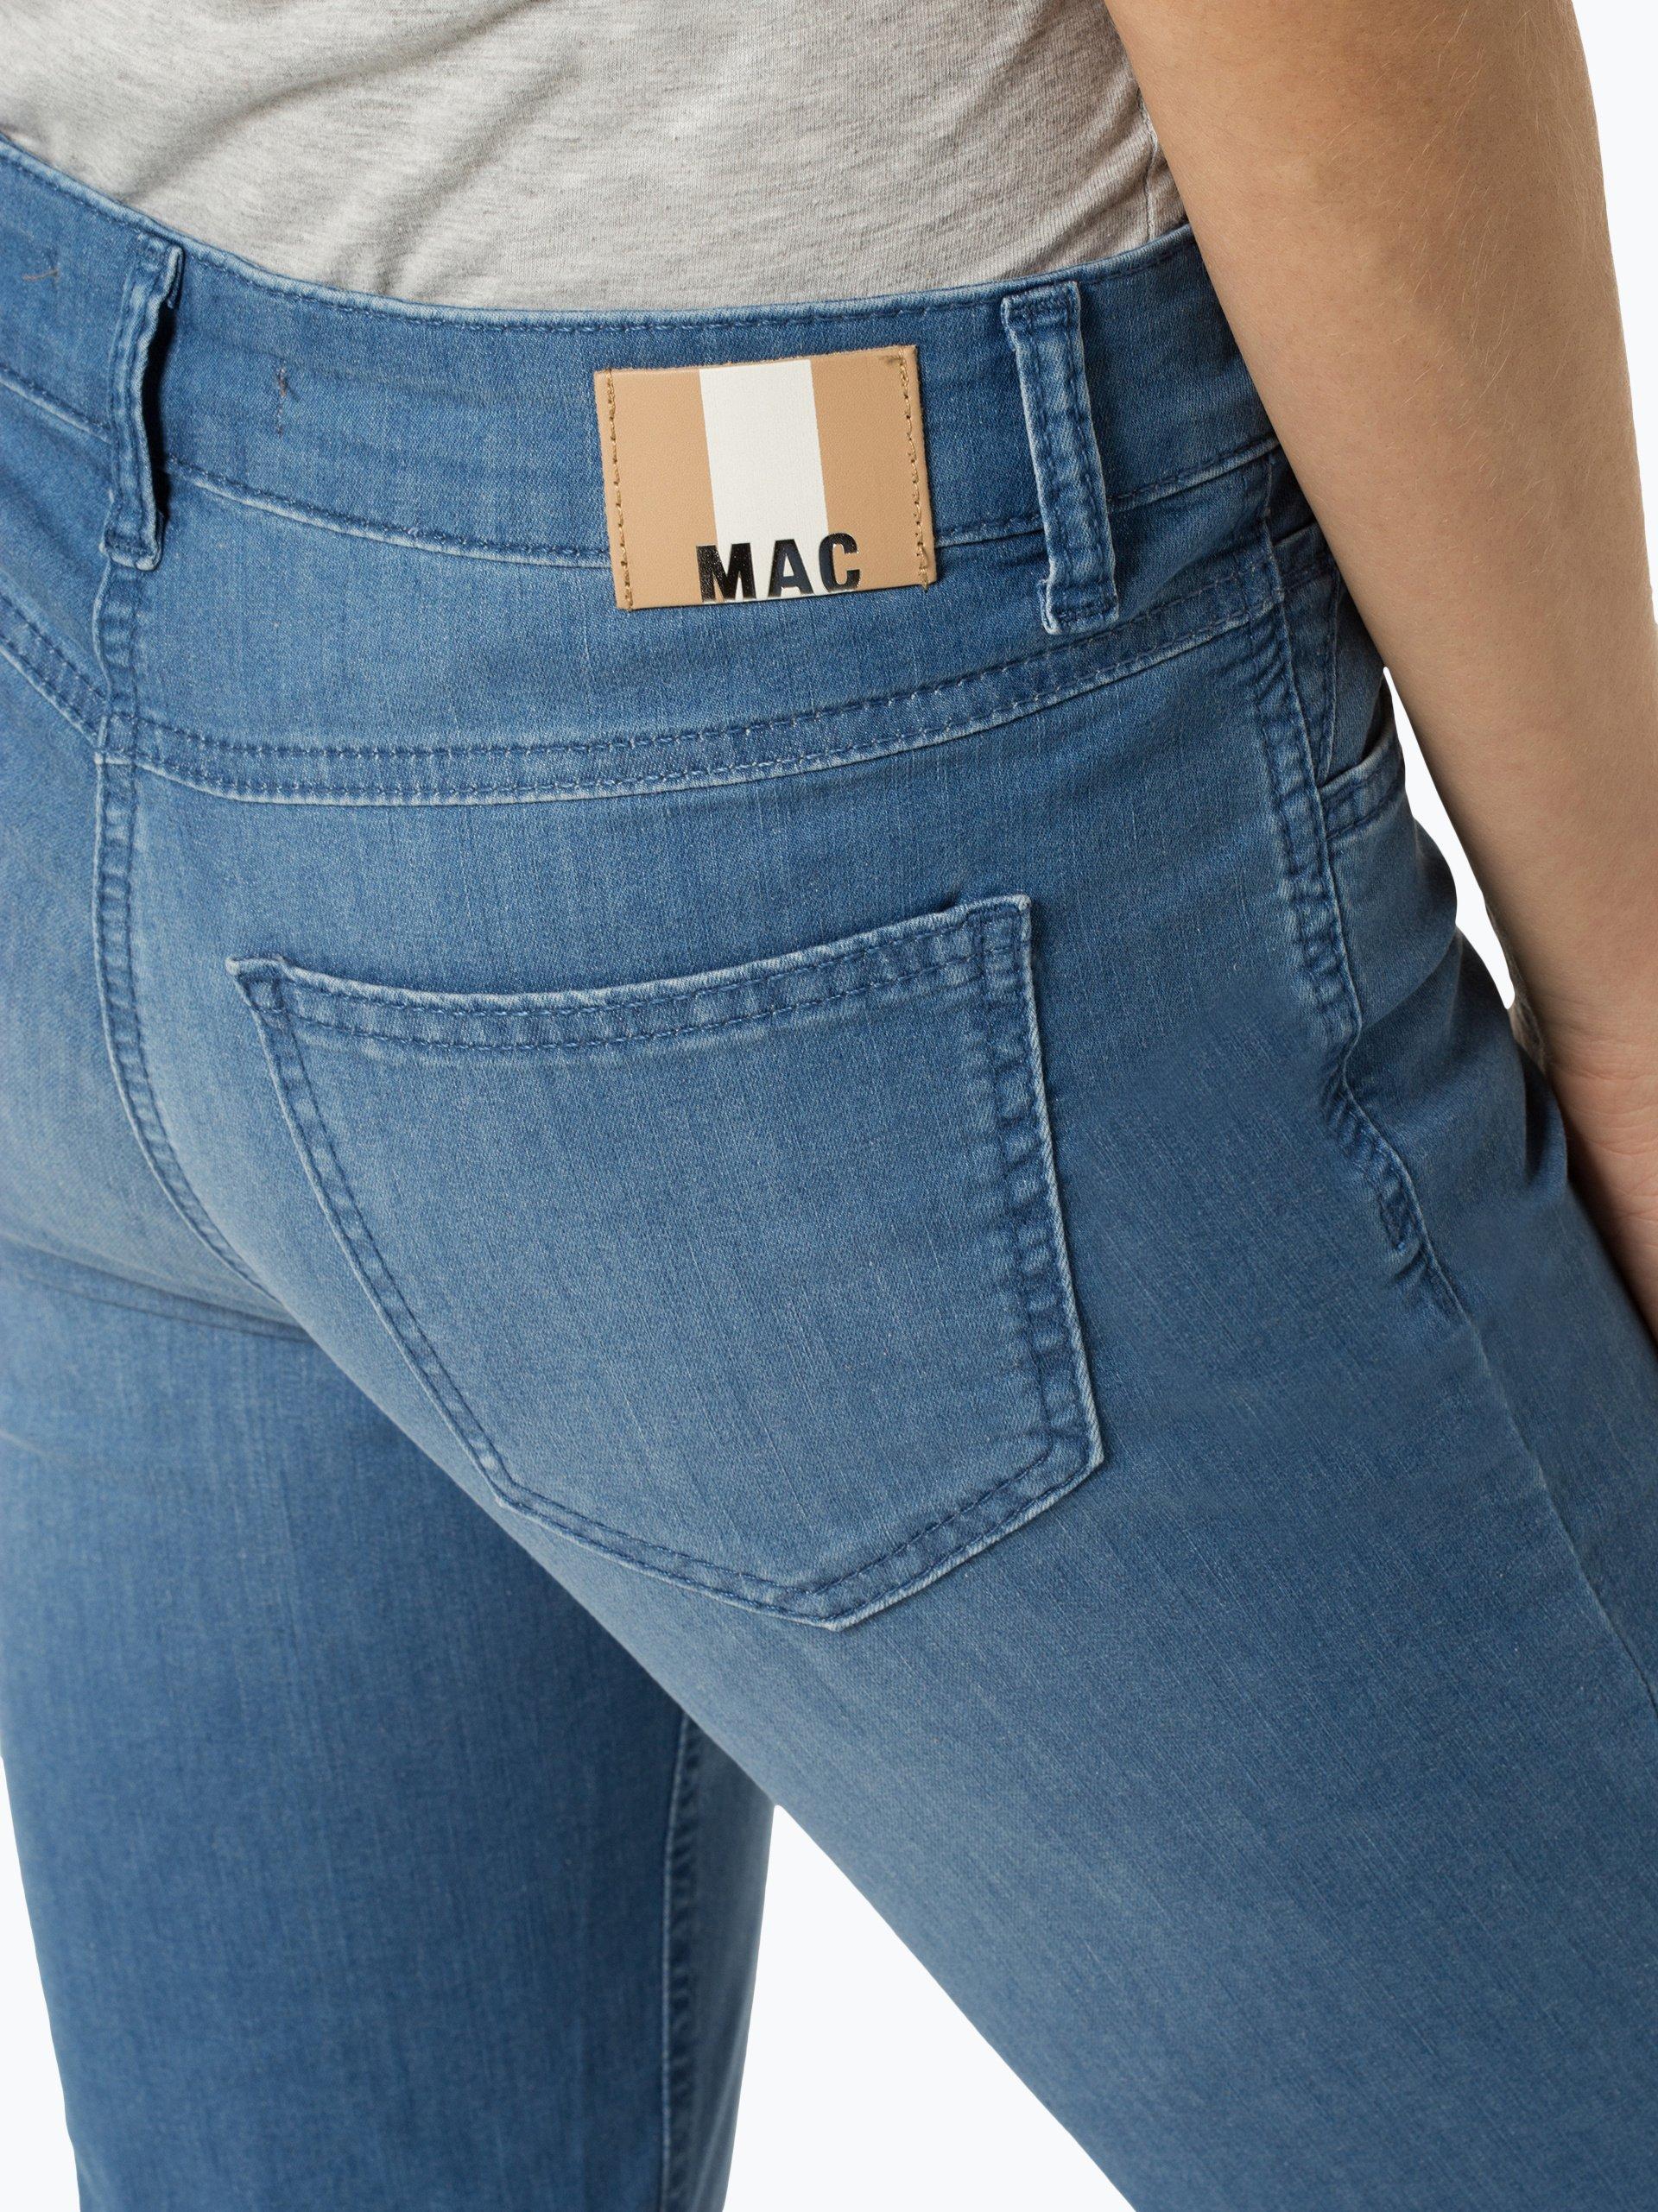 MAC Damen Jeans - Angela